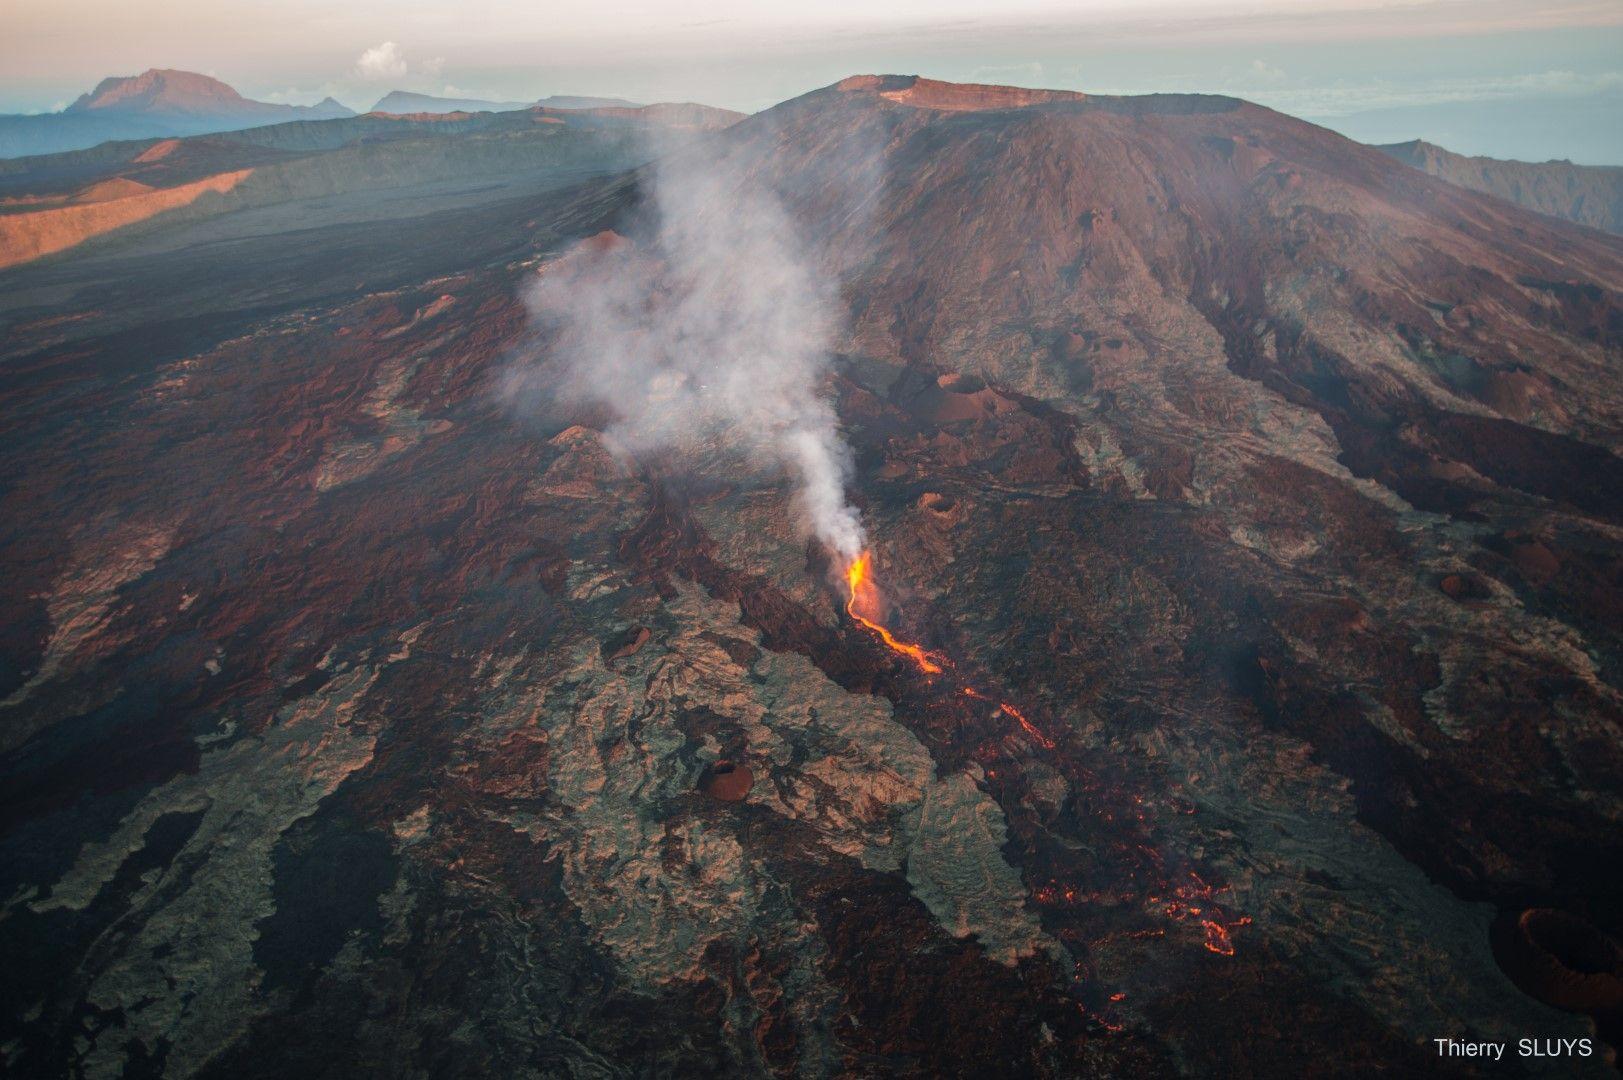 Eruption On Piton De La Fournaise Archipelago Natural Landmarks Volcano